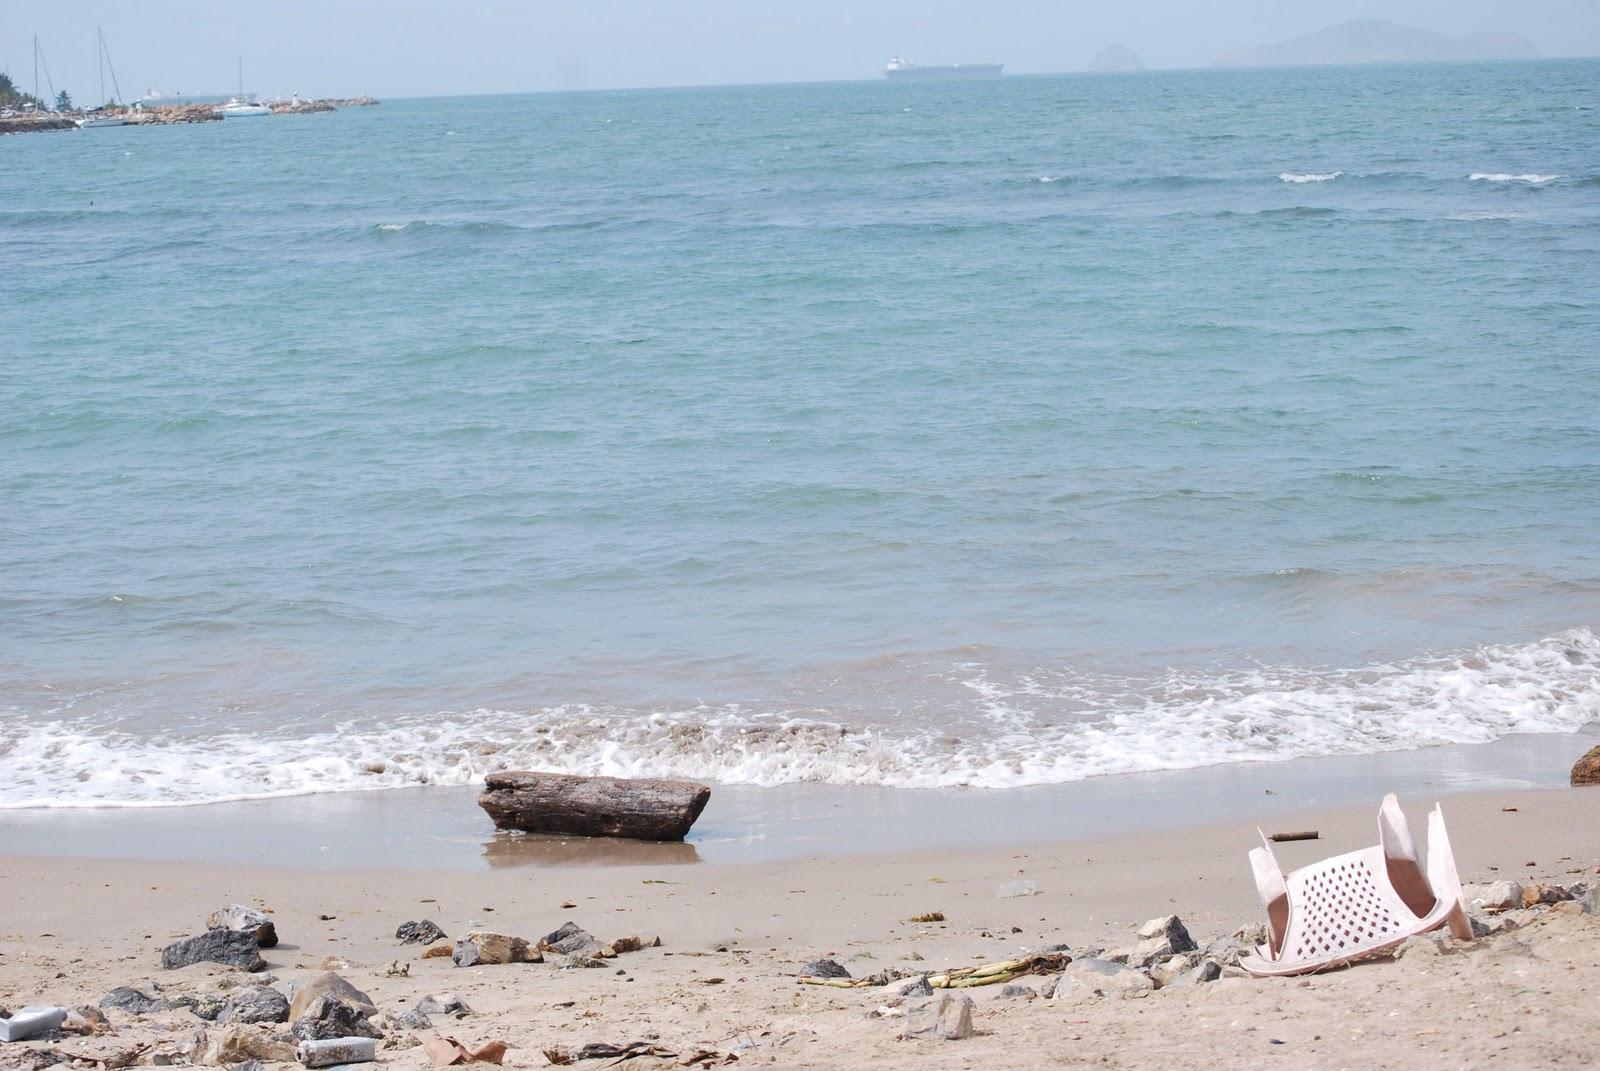 Lecheriaenvivo playa cangrejo atractivo tur stico for Sillas para maquillar